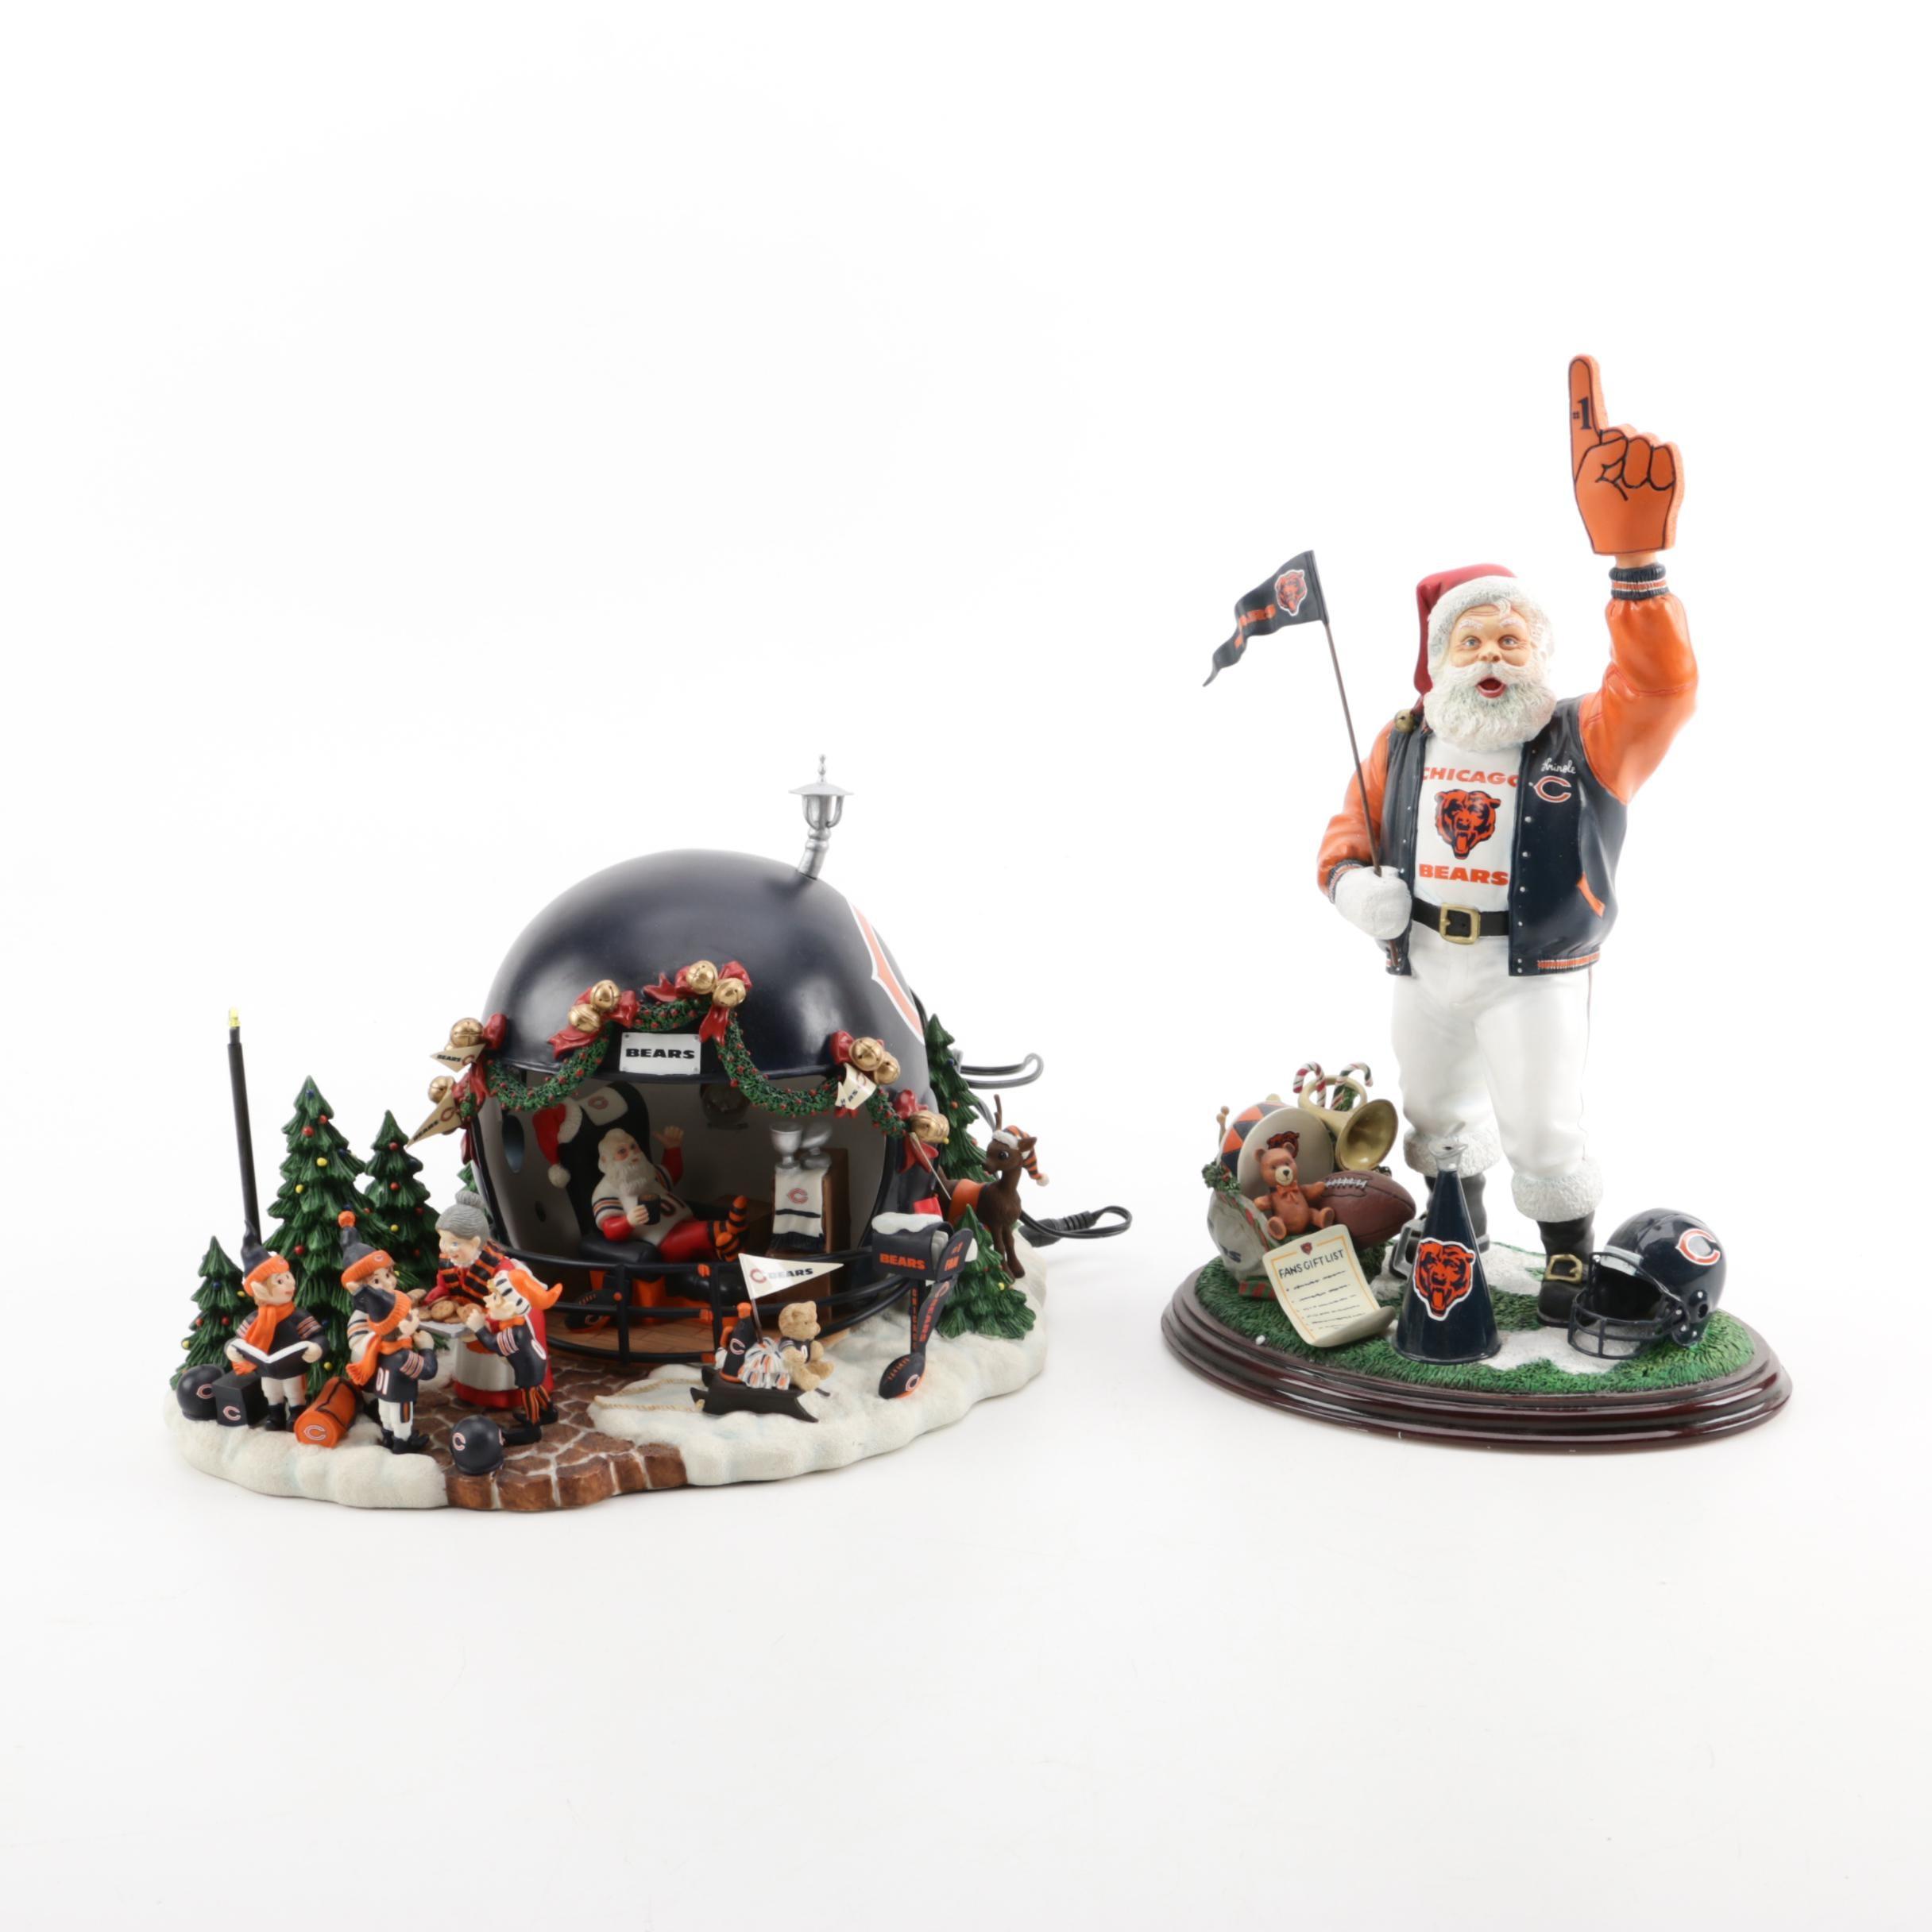 Chicago Bears Christmas Decor by Danbury Mint